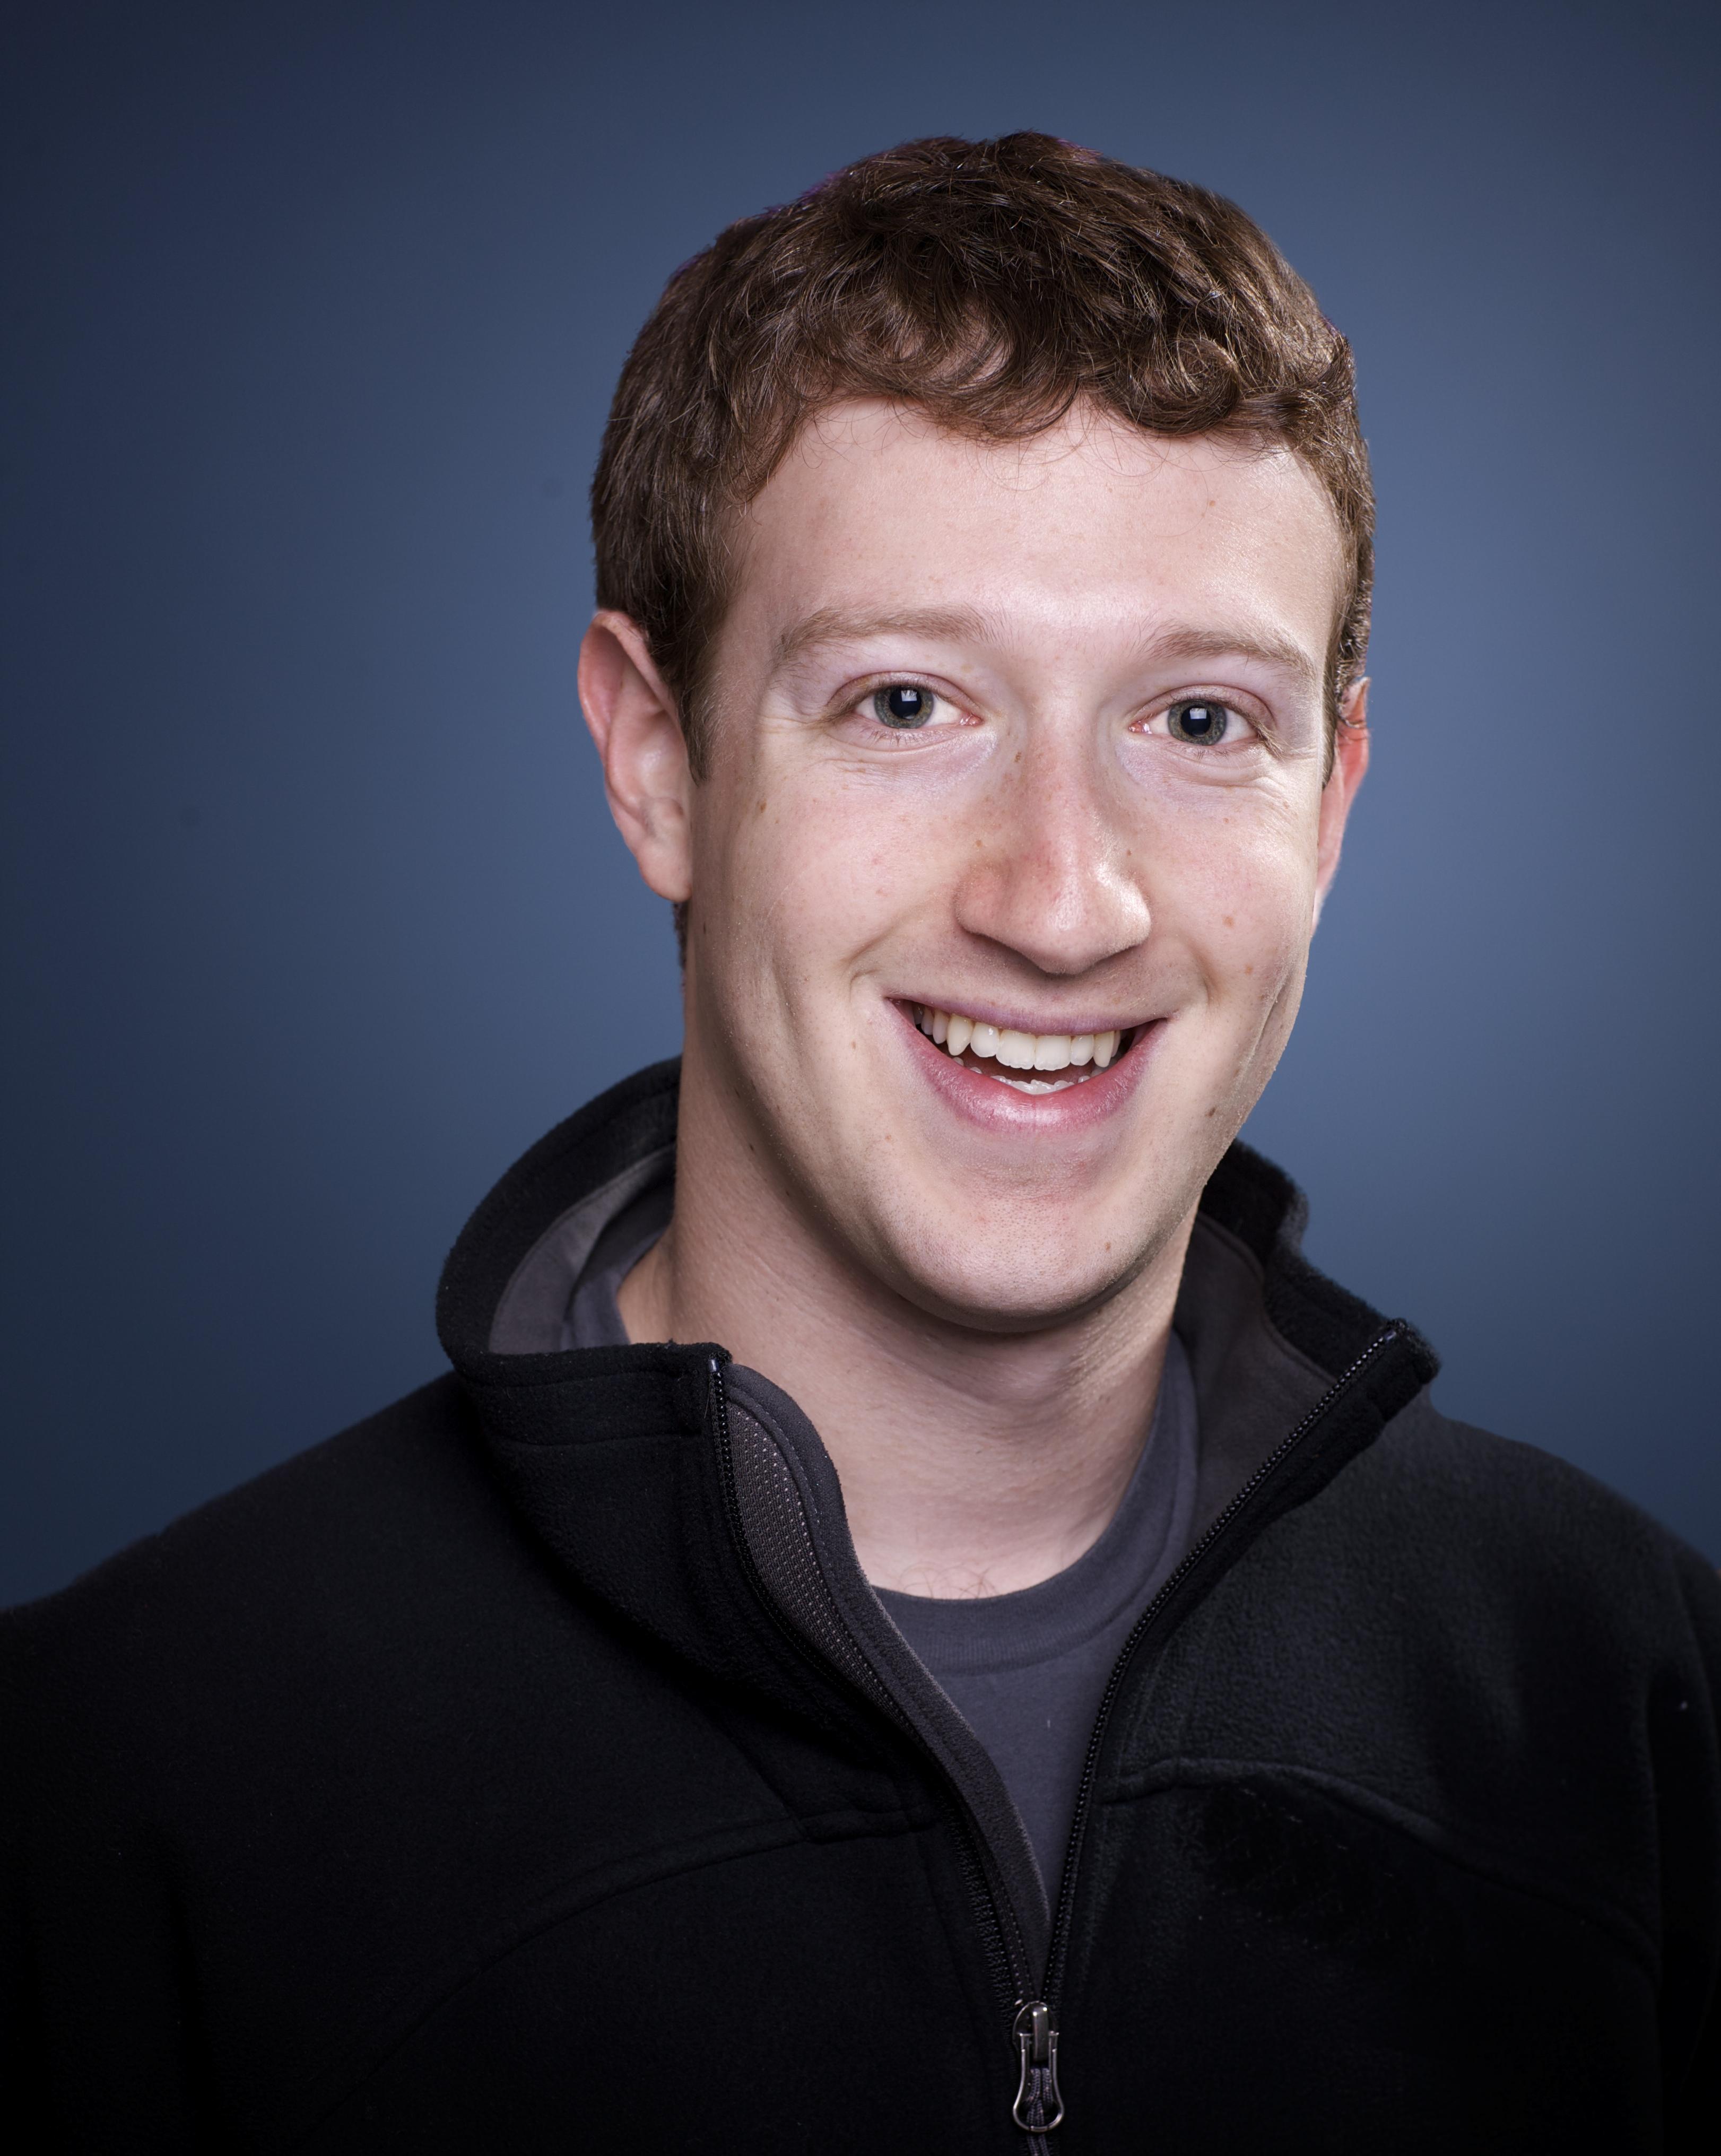 Awesome Mark Zuckerberg HD Wallpaper Download 3244x4064